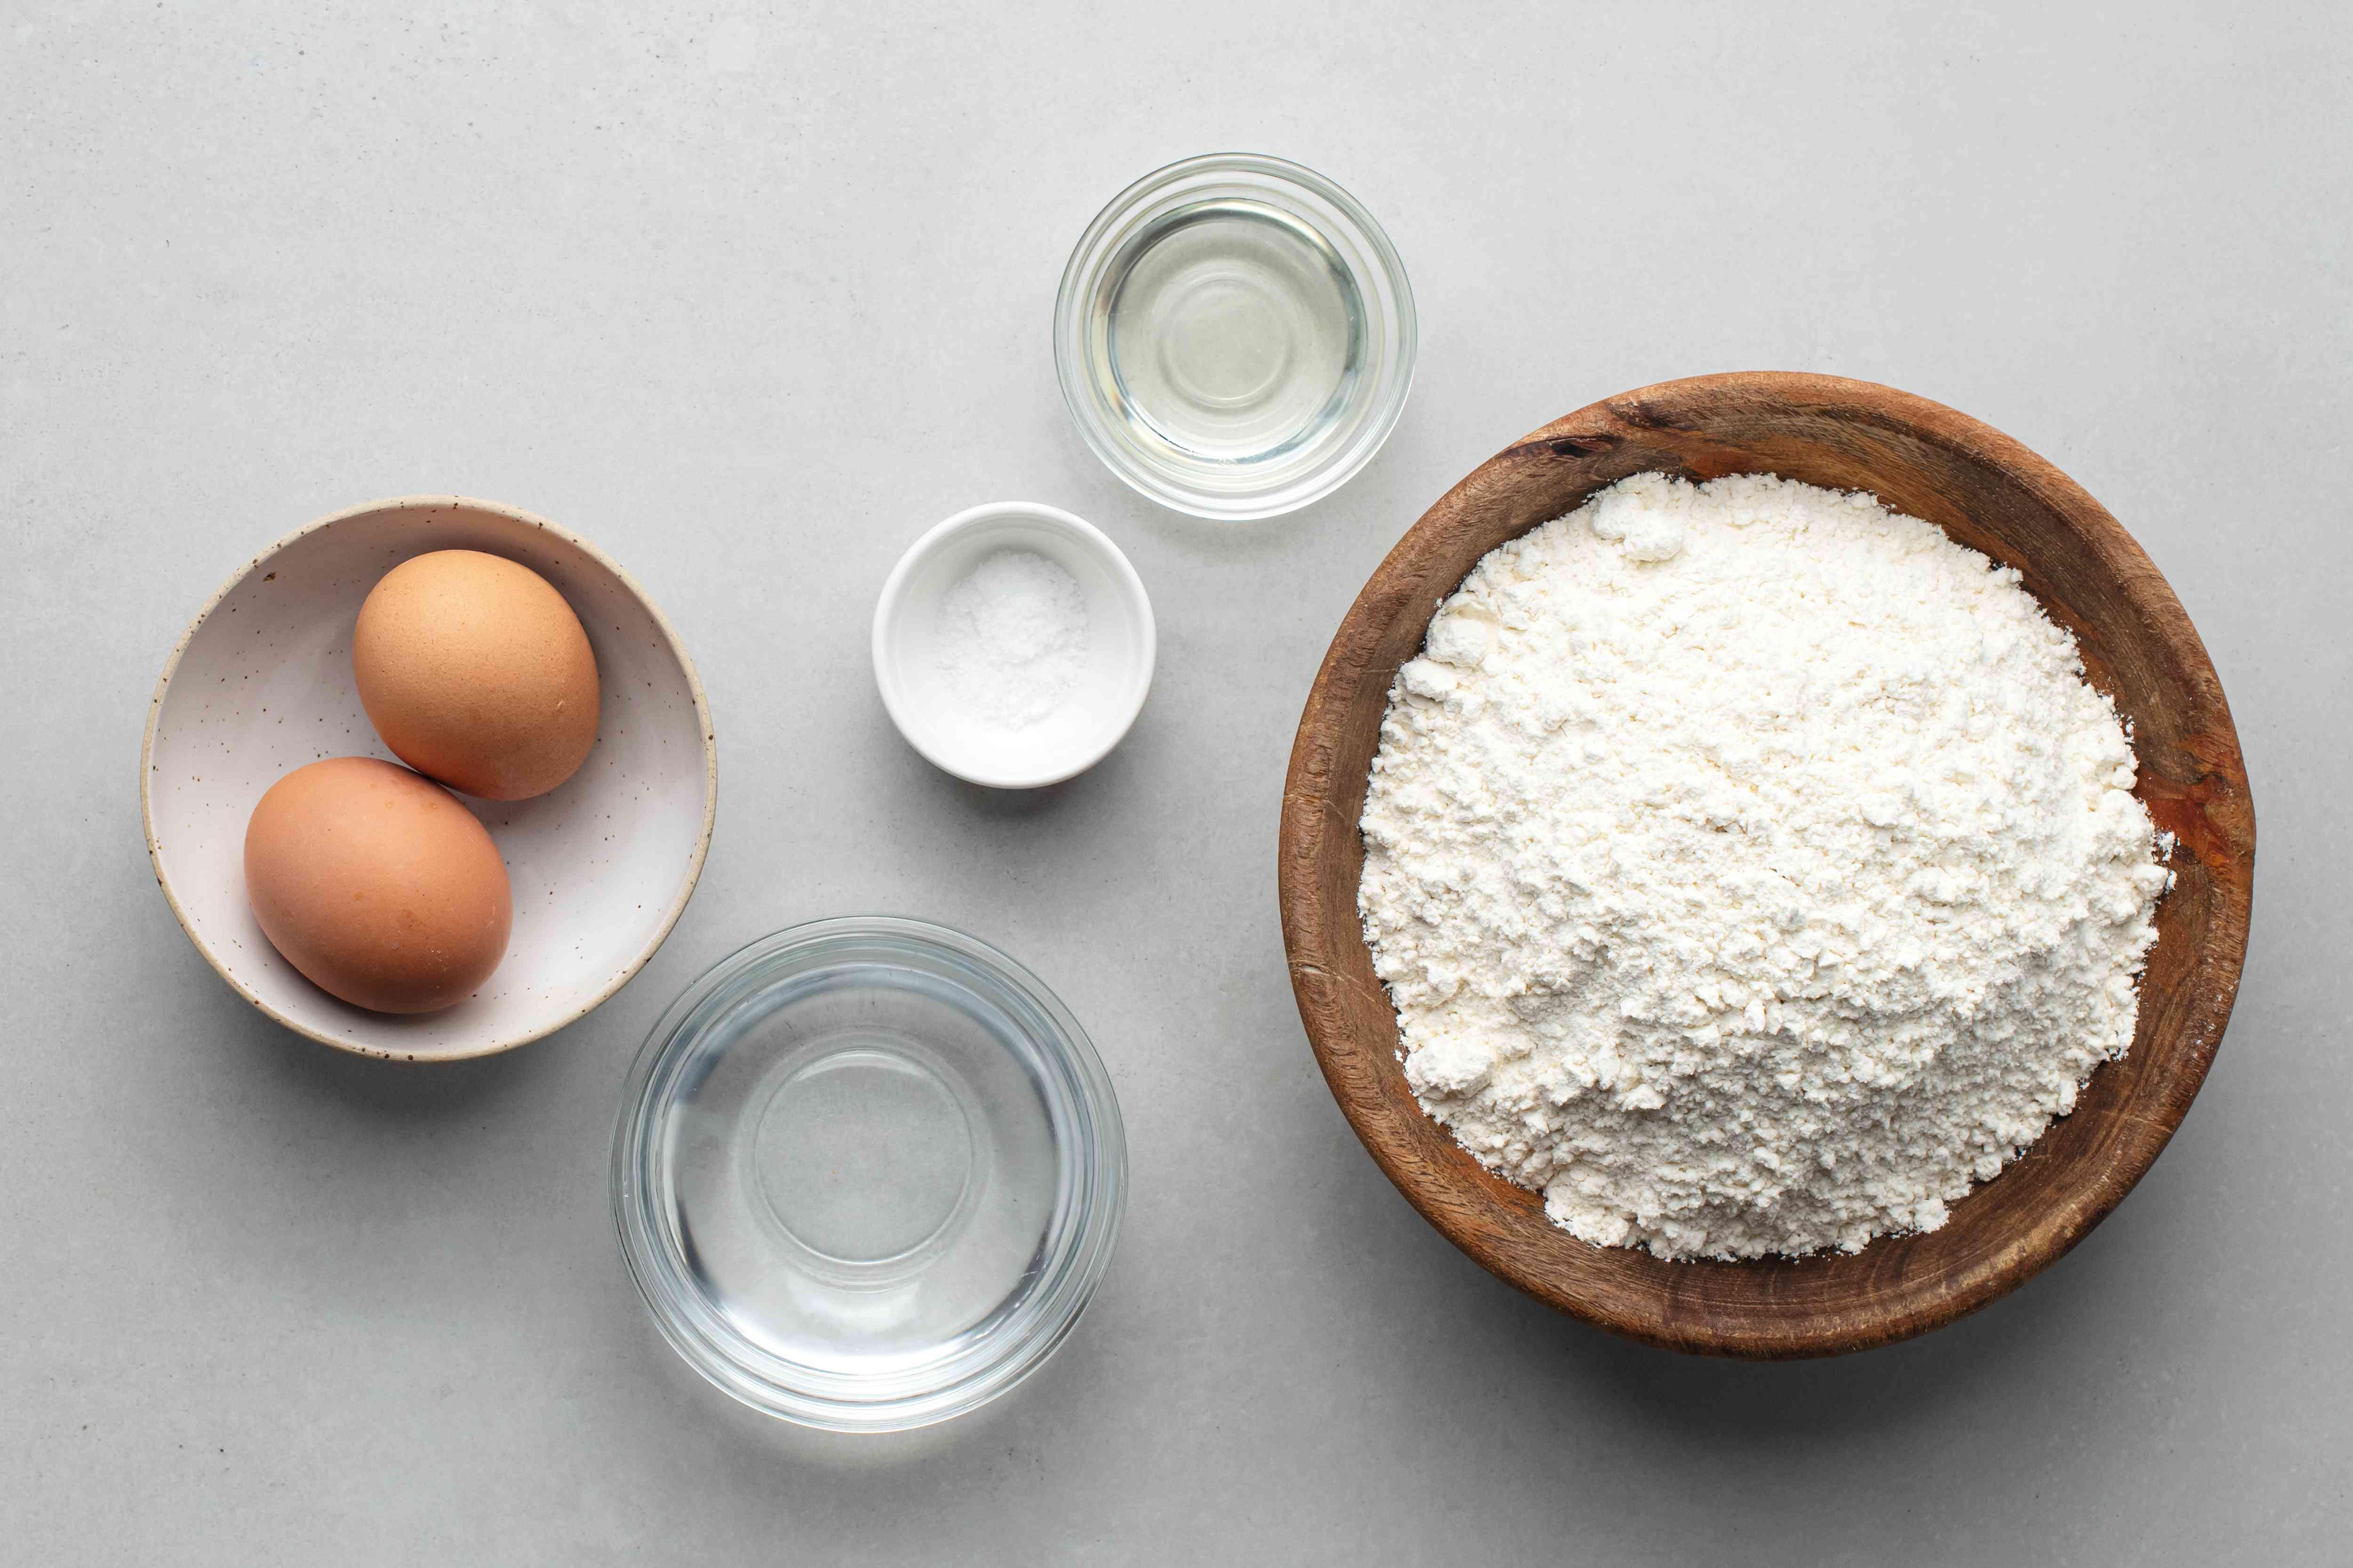 pelmeni dough ingredients